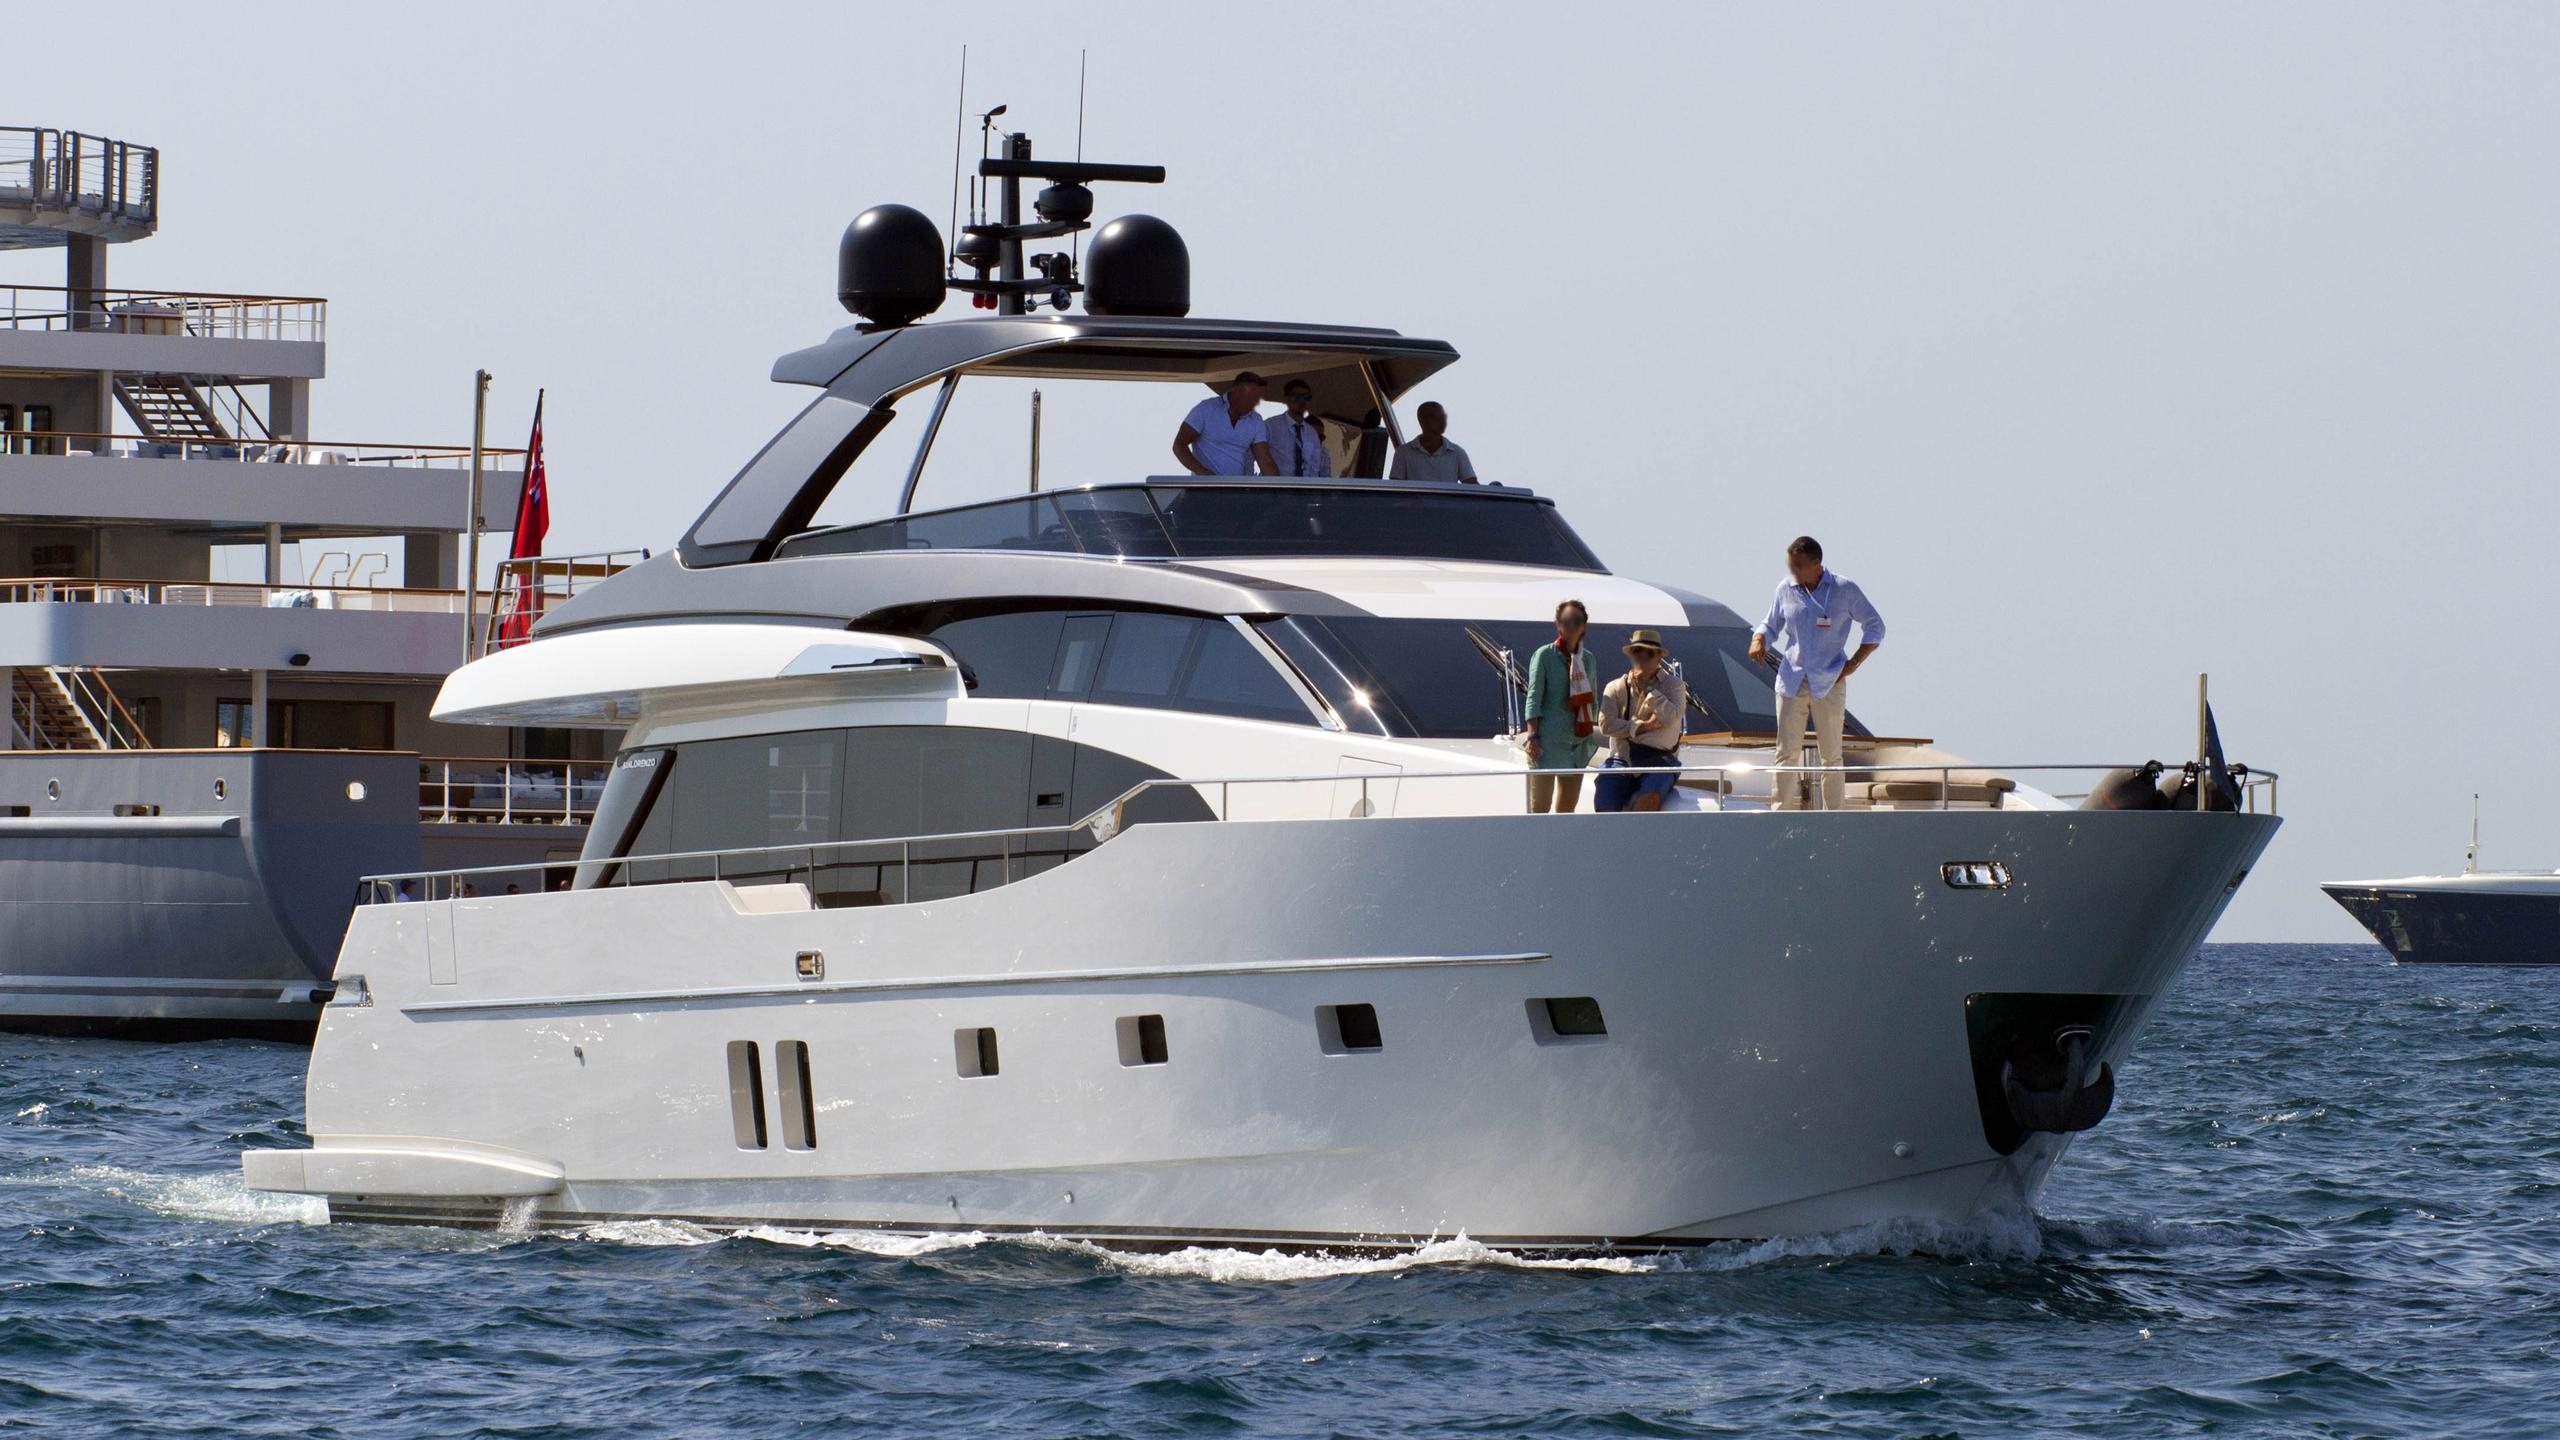 sailing elegance motoryacht sanlorenzo sl78 2016 25m half profile